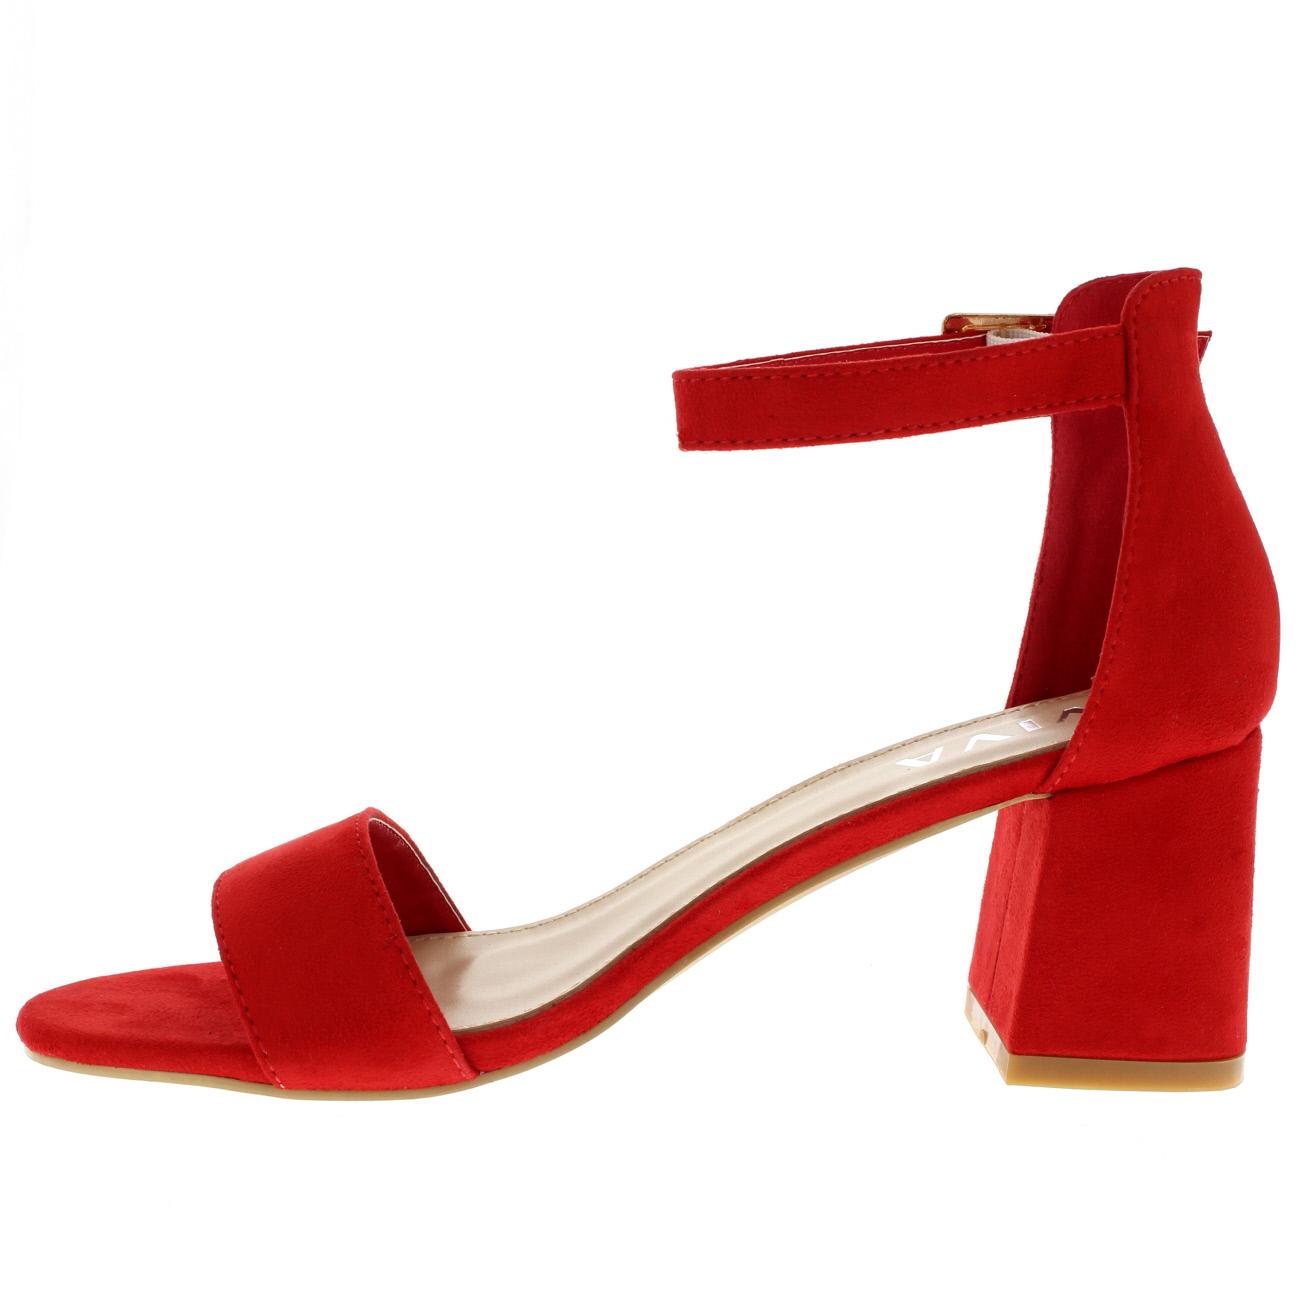 Lilley Zapato con Punta Abierta, de Tacón EN Bloque, Negro, Para Mujer Talla 4 UK/37 EU - Negro